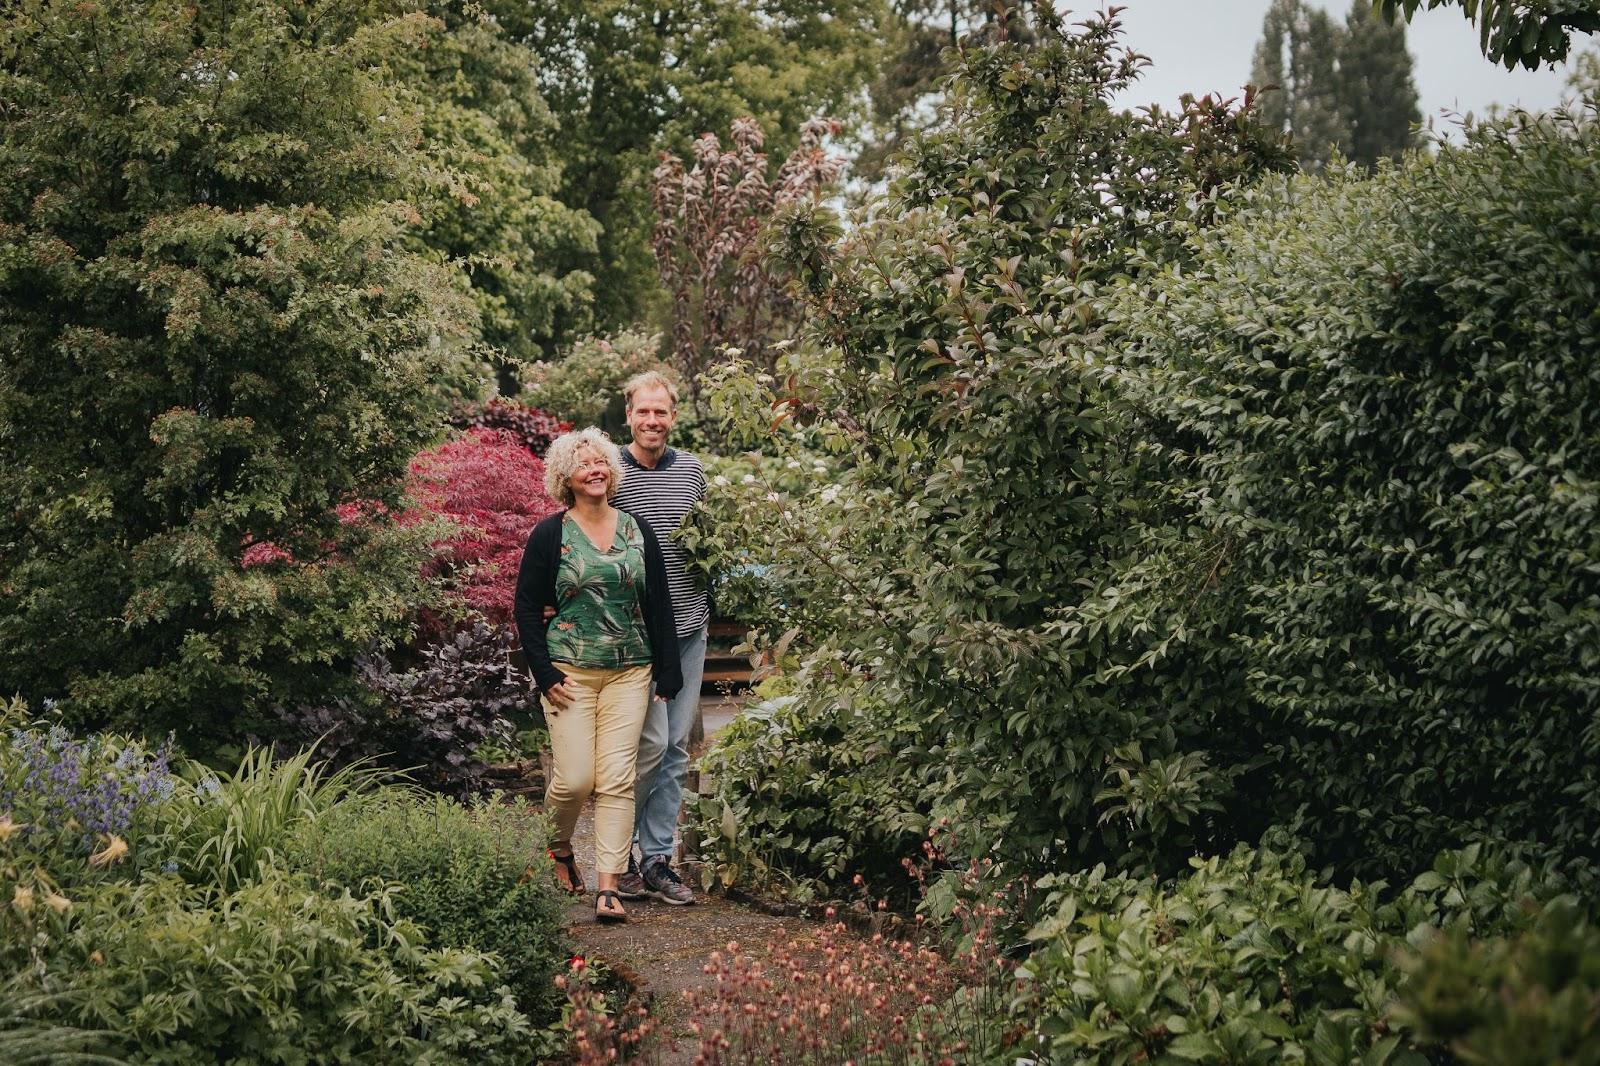 Benefits of sharing economy Campspace hosts in garden